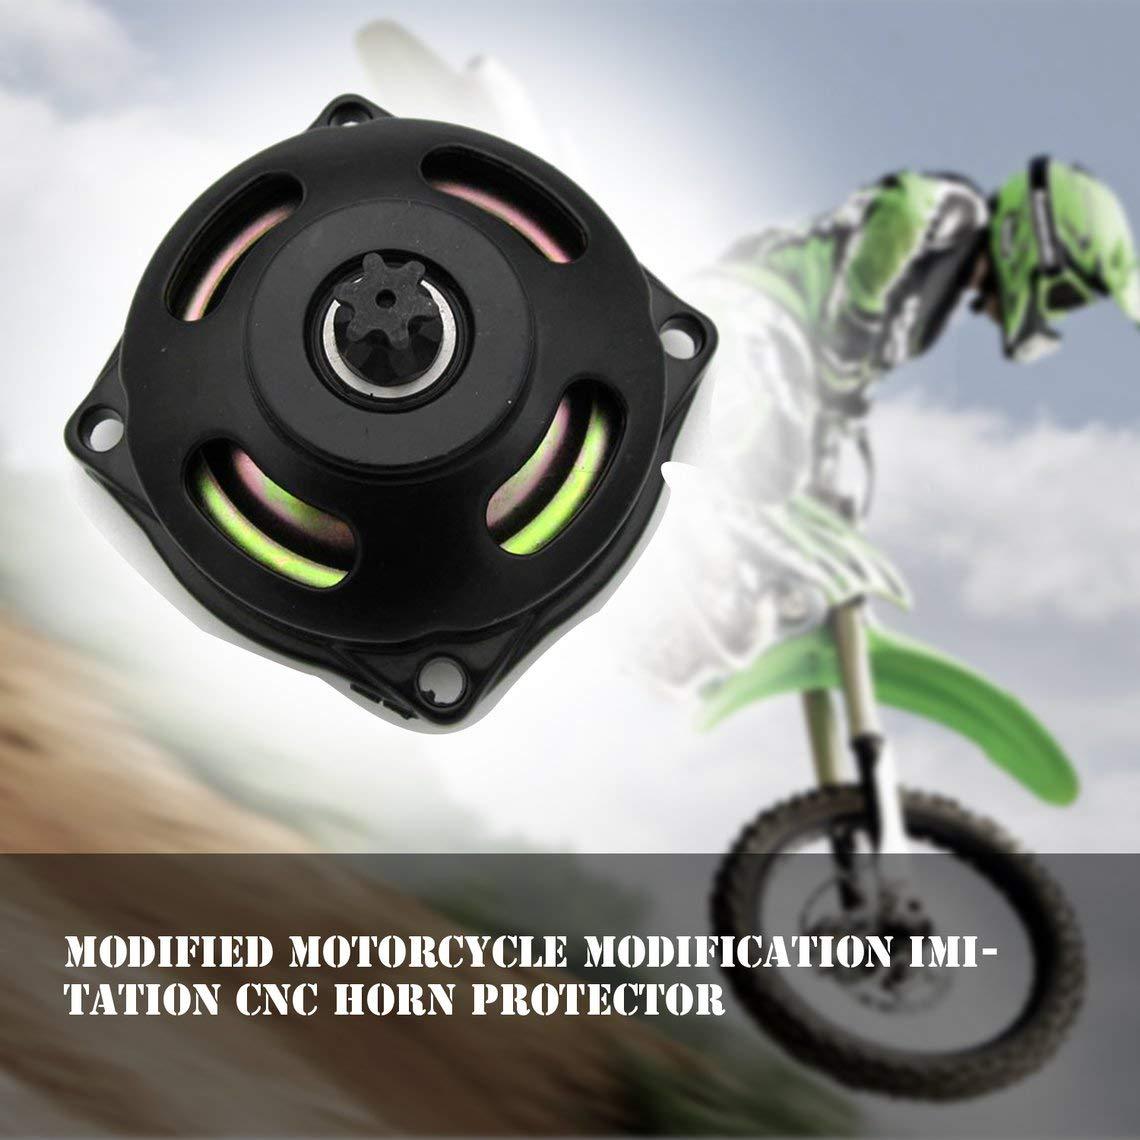 ZinESaya 40-6 25 H 6 T Diente Embrague Tambor Caja de Cambios 47cc 49cc 2 Tiempos Motor ATV Quad Go Kart Dirt Pocket Mini Bicicleta Motocross Motocicleta